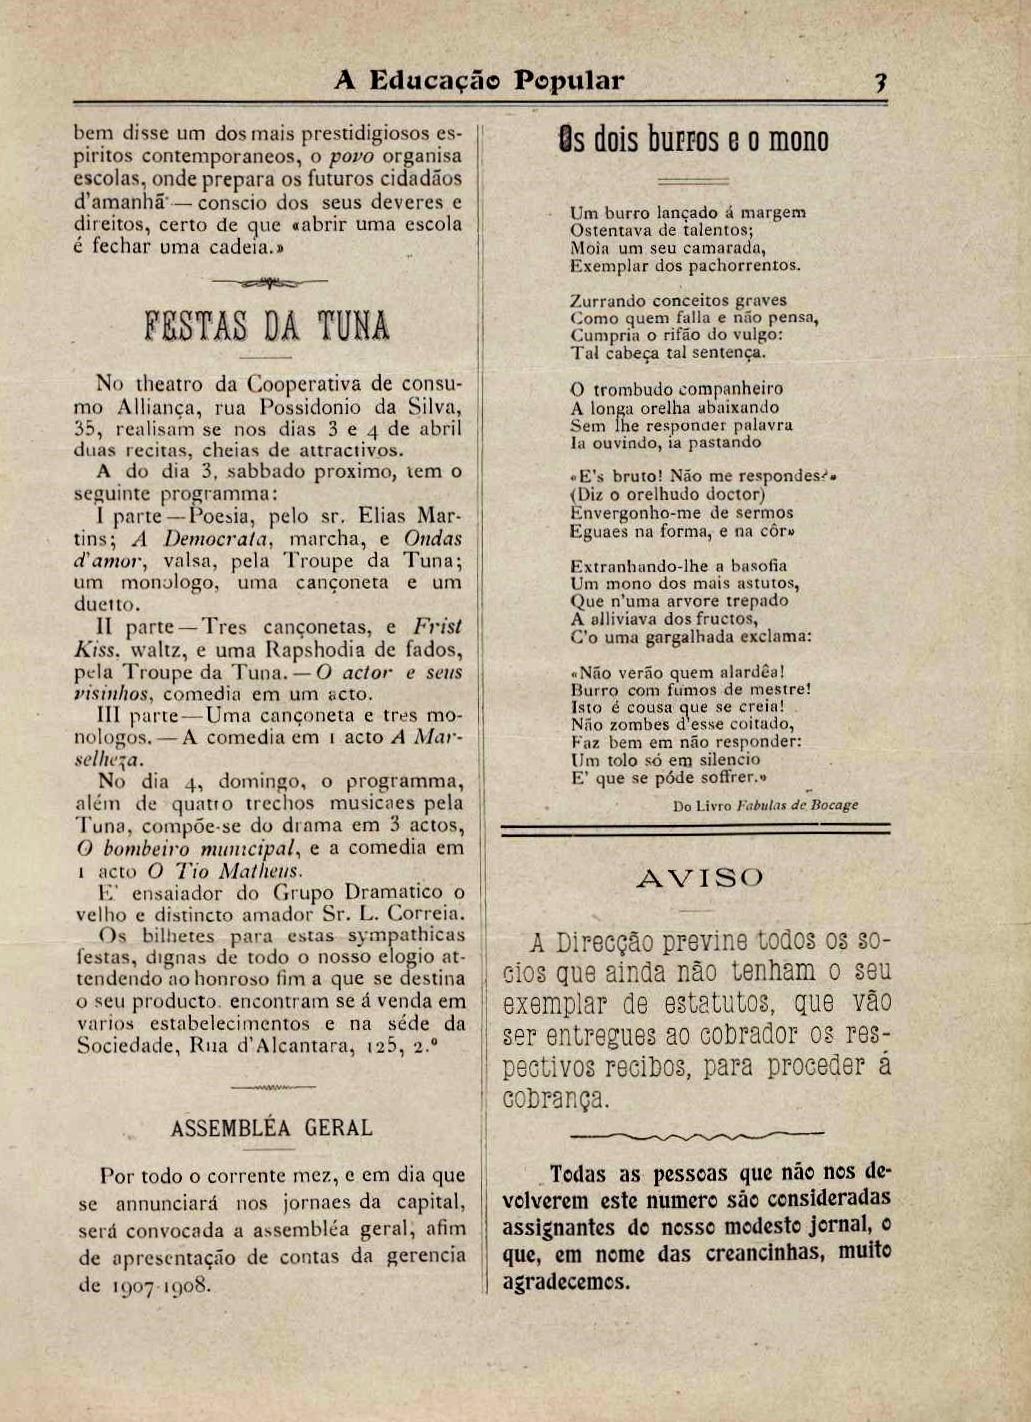 [1909-A-Educao-Popular.310]